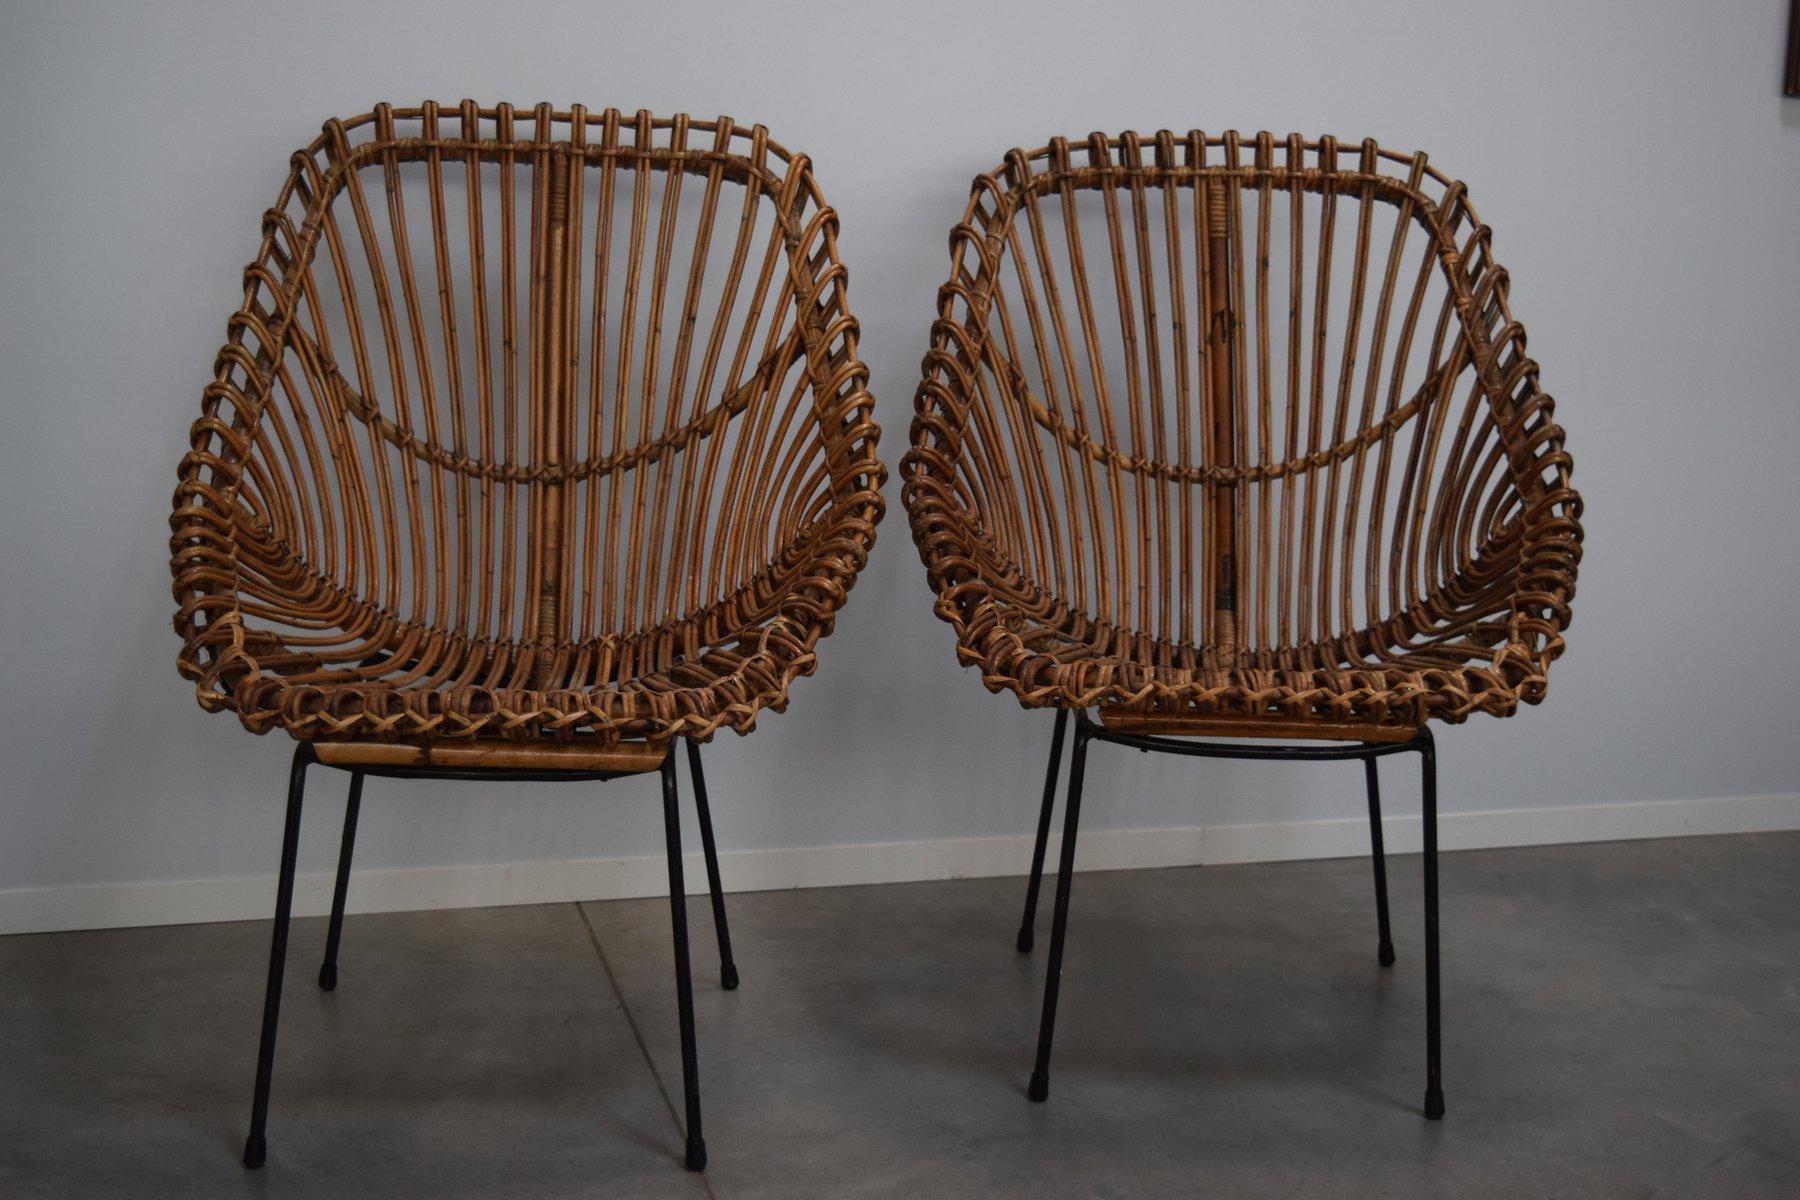 italienische giunco rattan st hle 1950er 2er set bei pamono kaufen. Black Bedroom Furniture Sets. Home Design Ideas